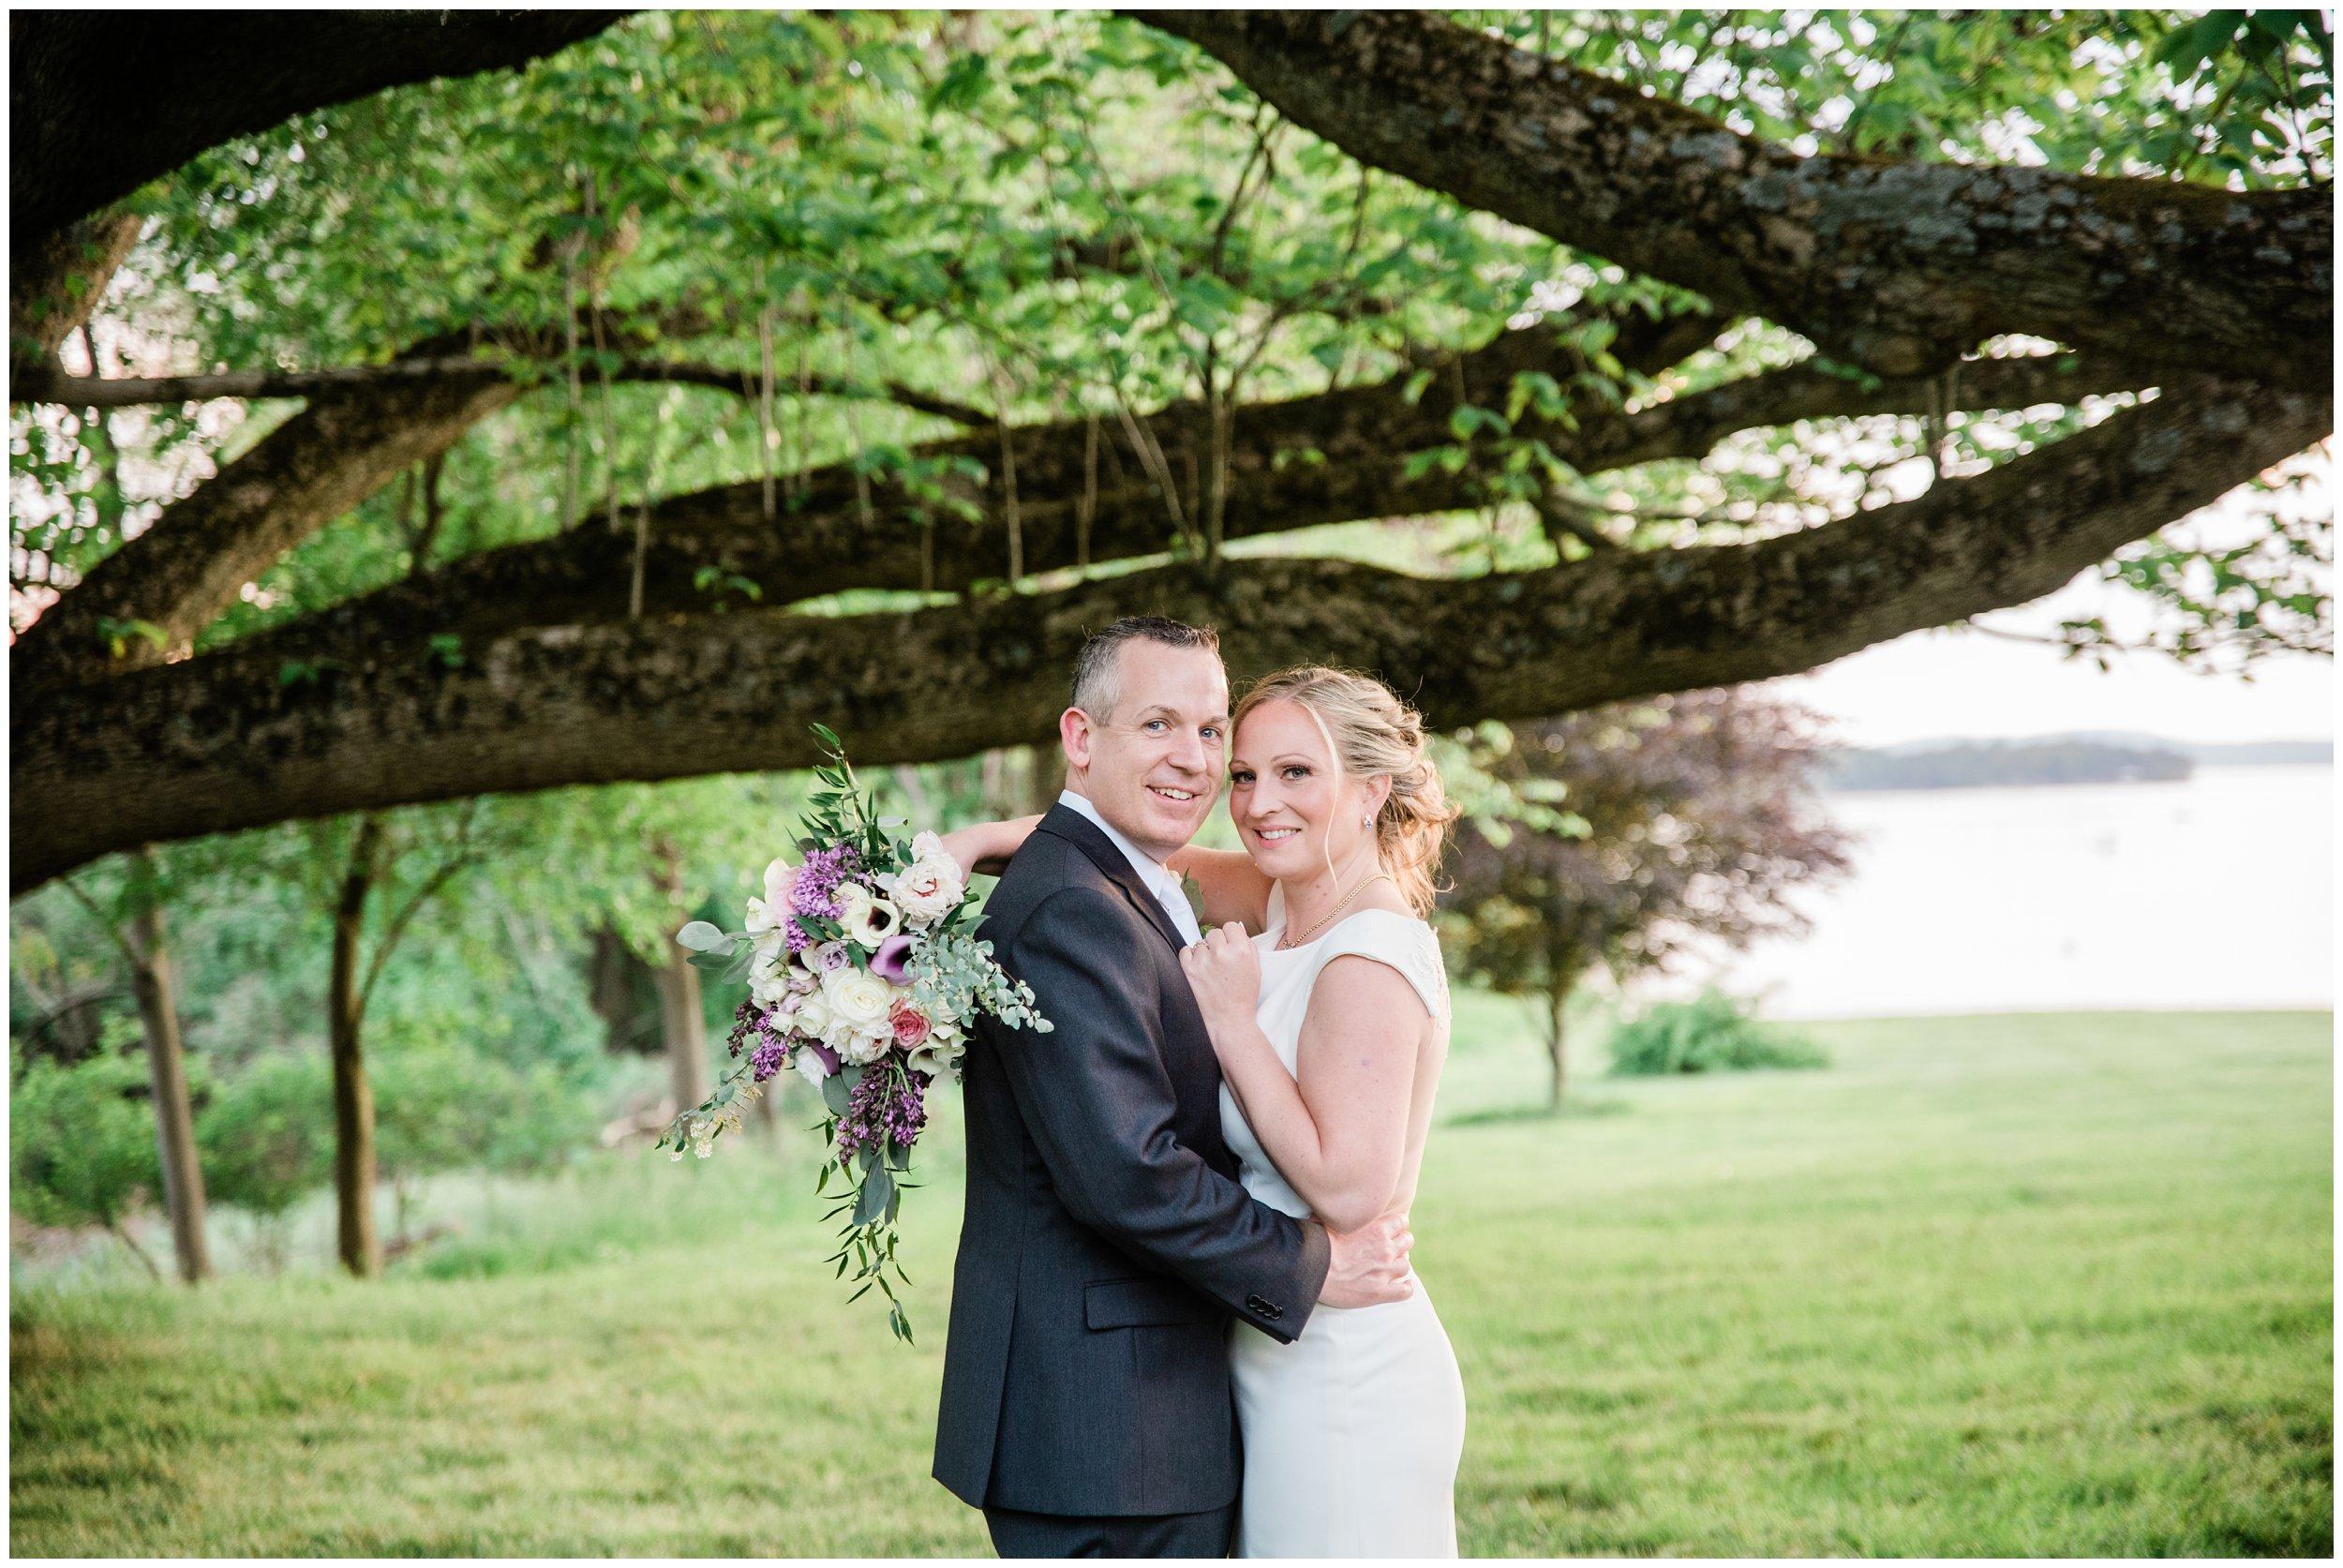 sunset wedding portrait under giant tree